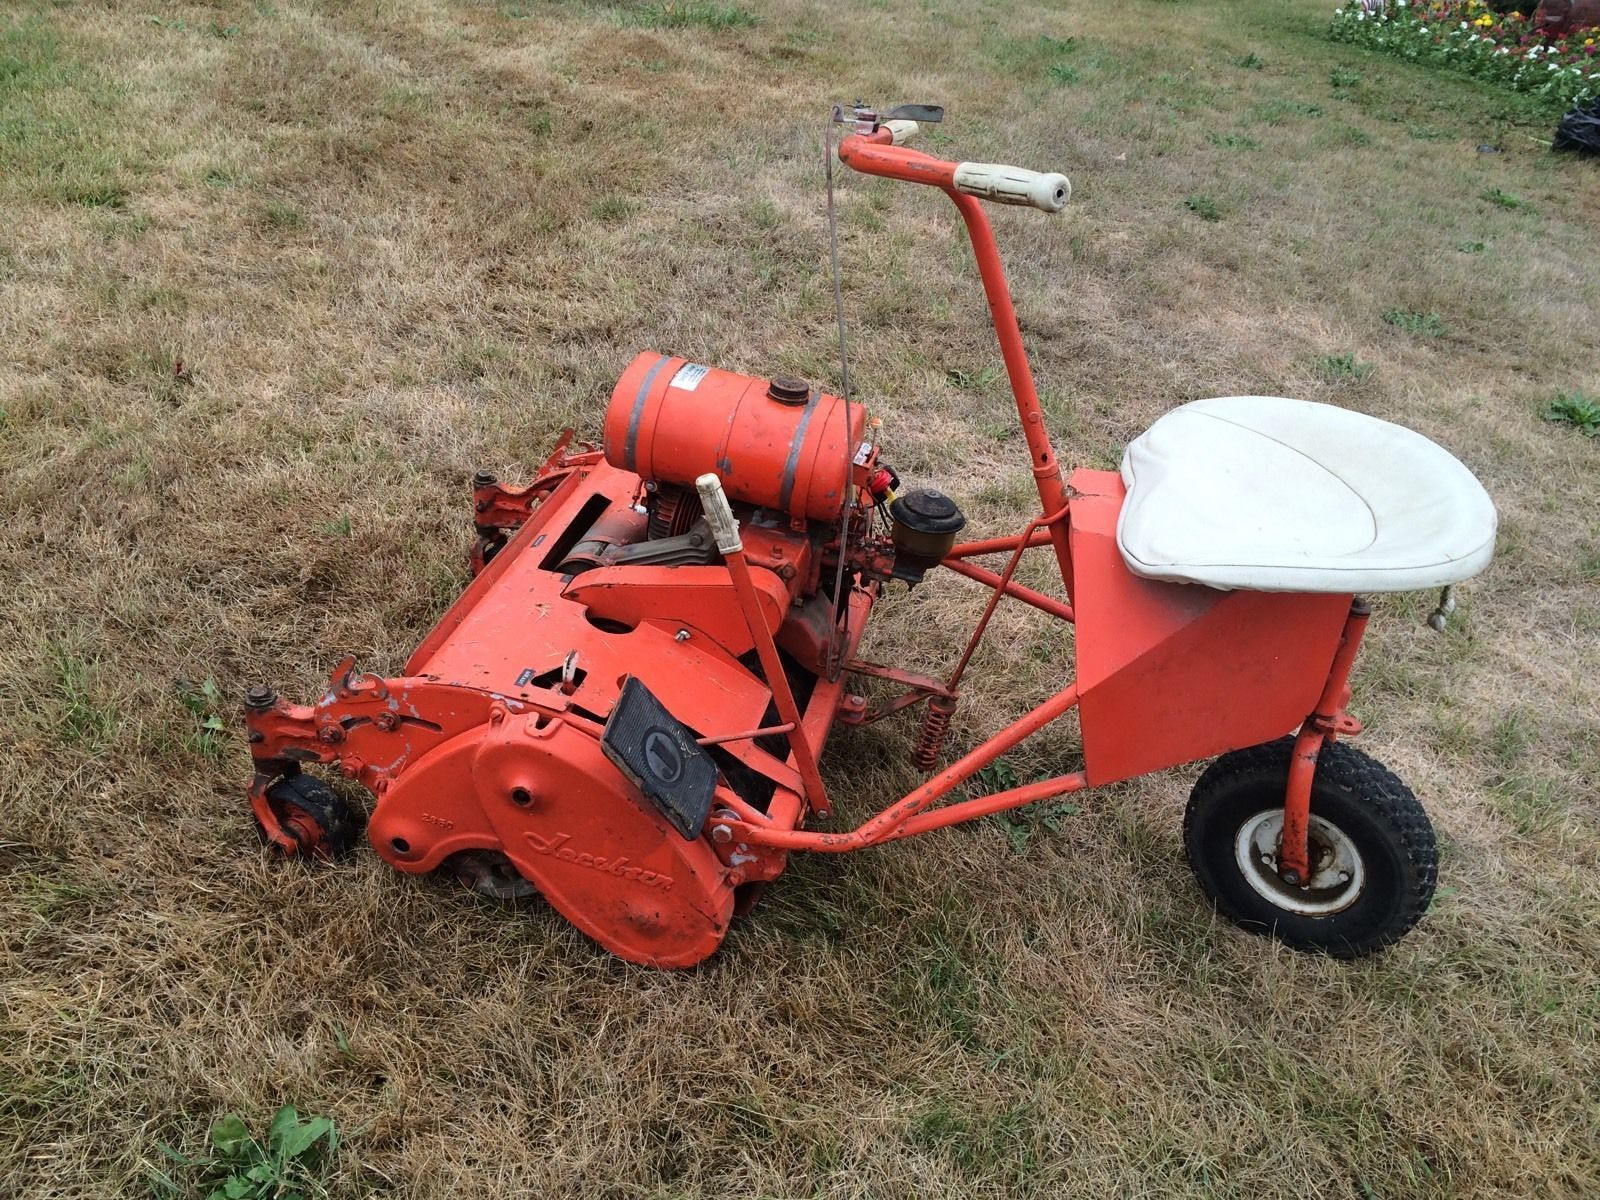 Vintage Mowers Gallery Lawn Mower Lawn Mower Tractor Lawn Tractor